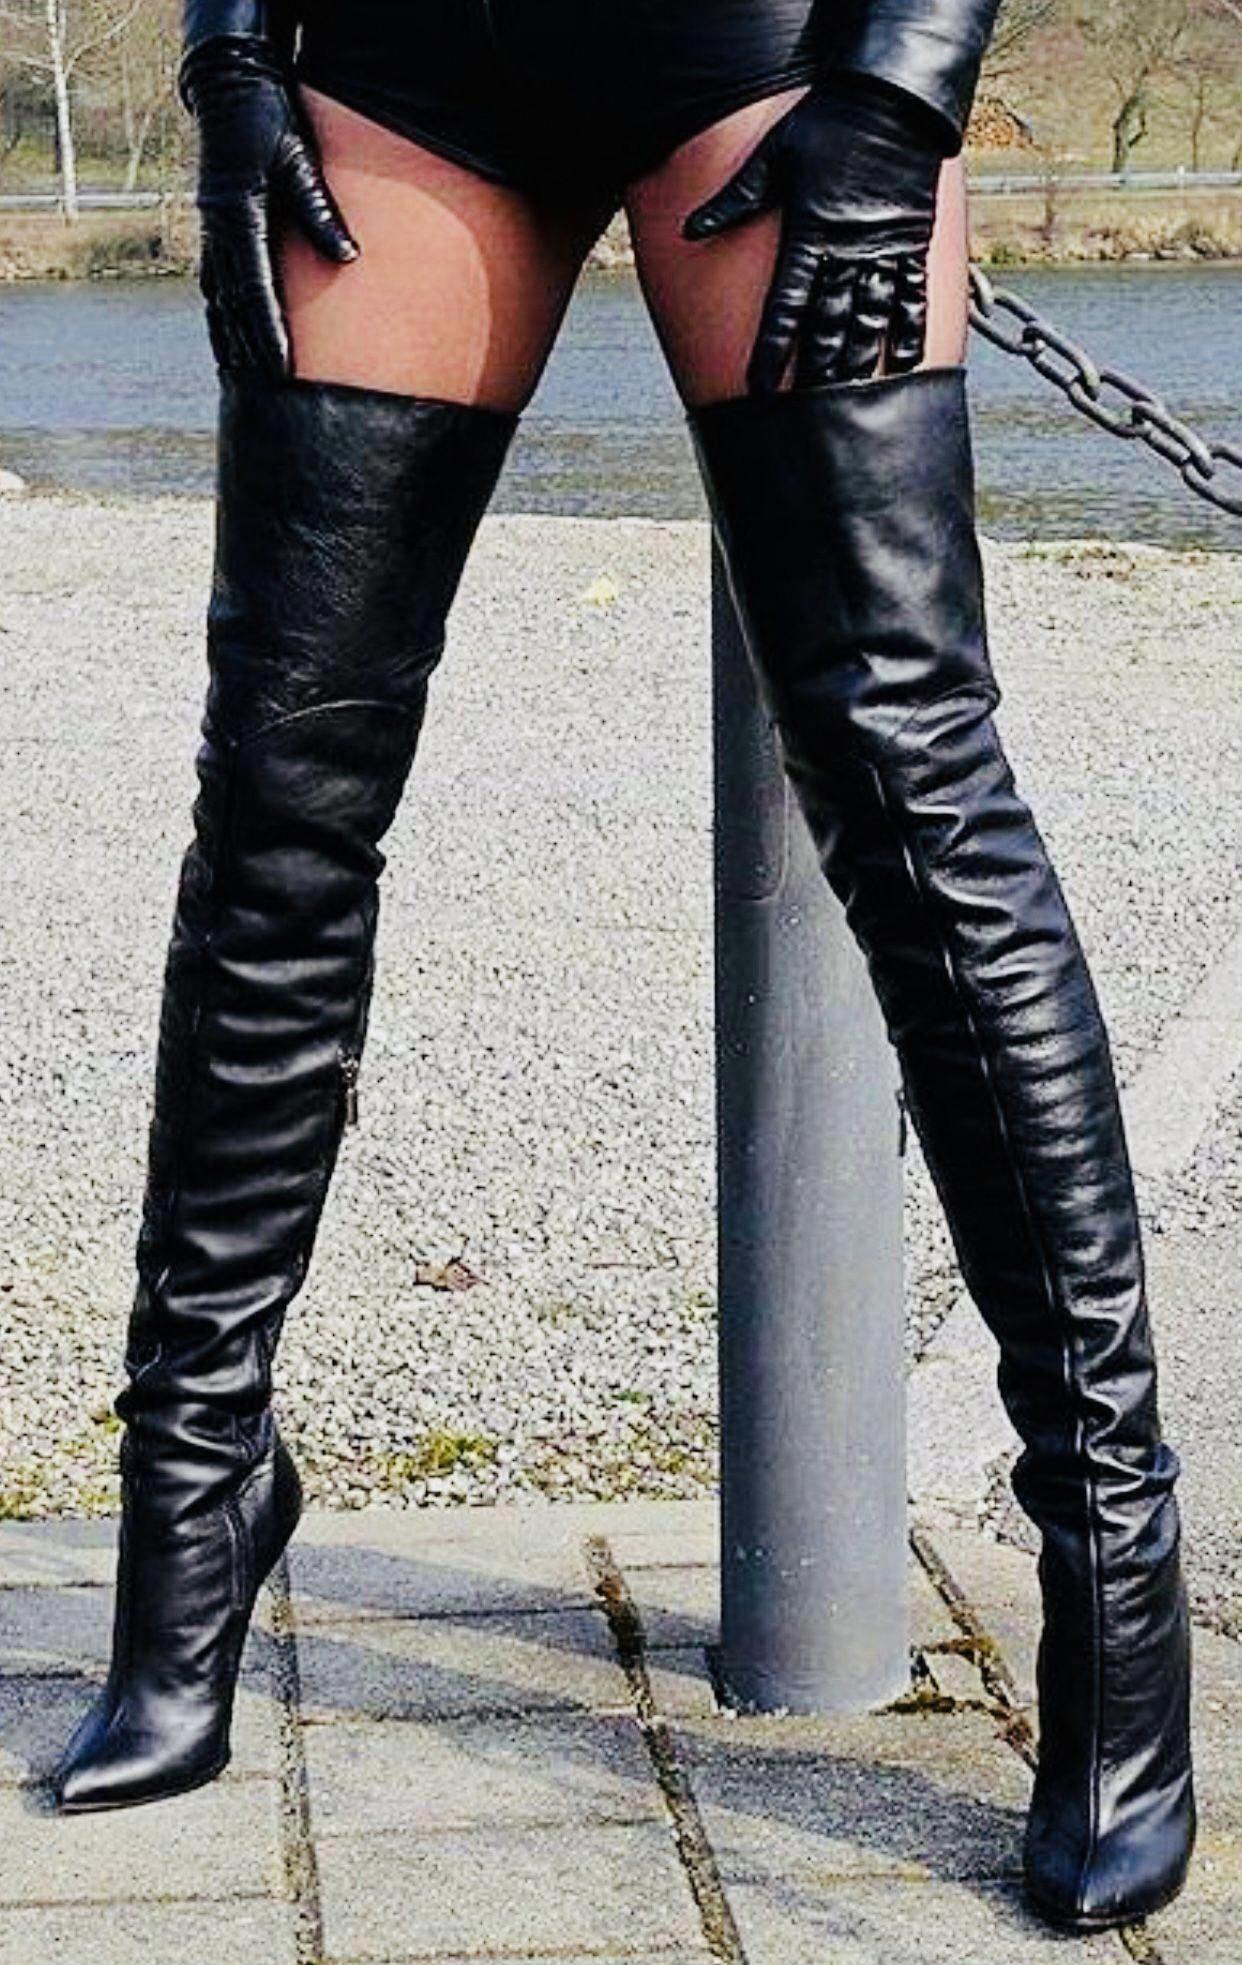 High heels boots #Highheelboots | Minigonne, Stivali alti